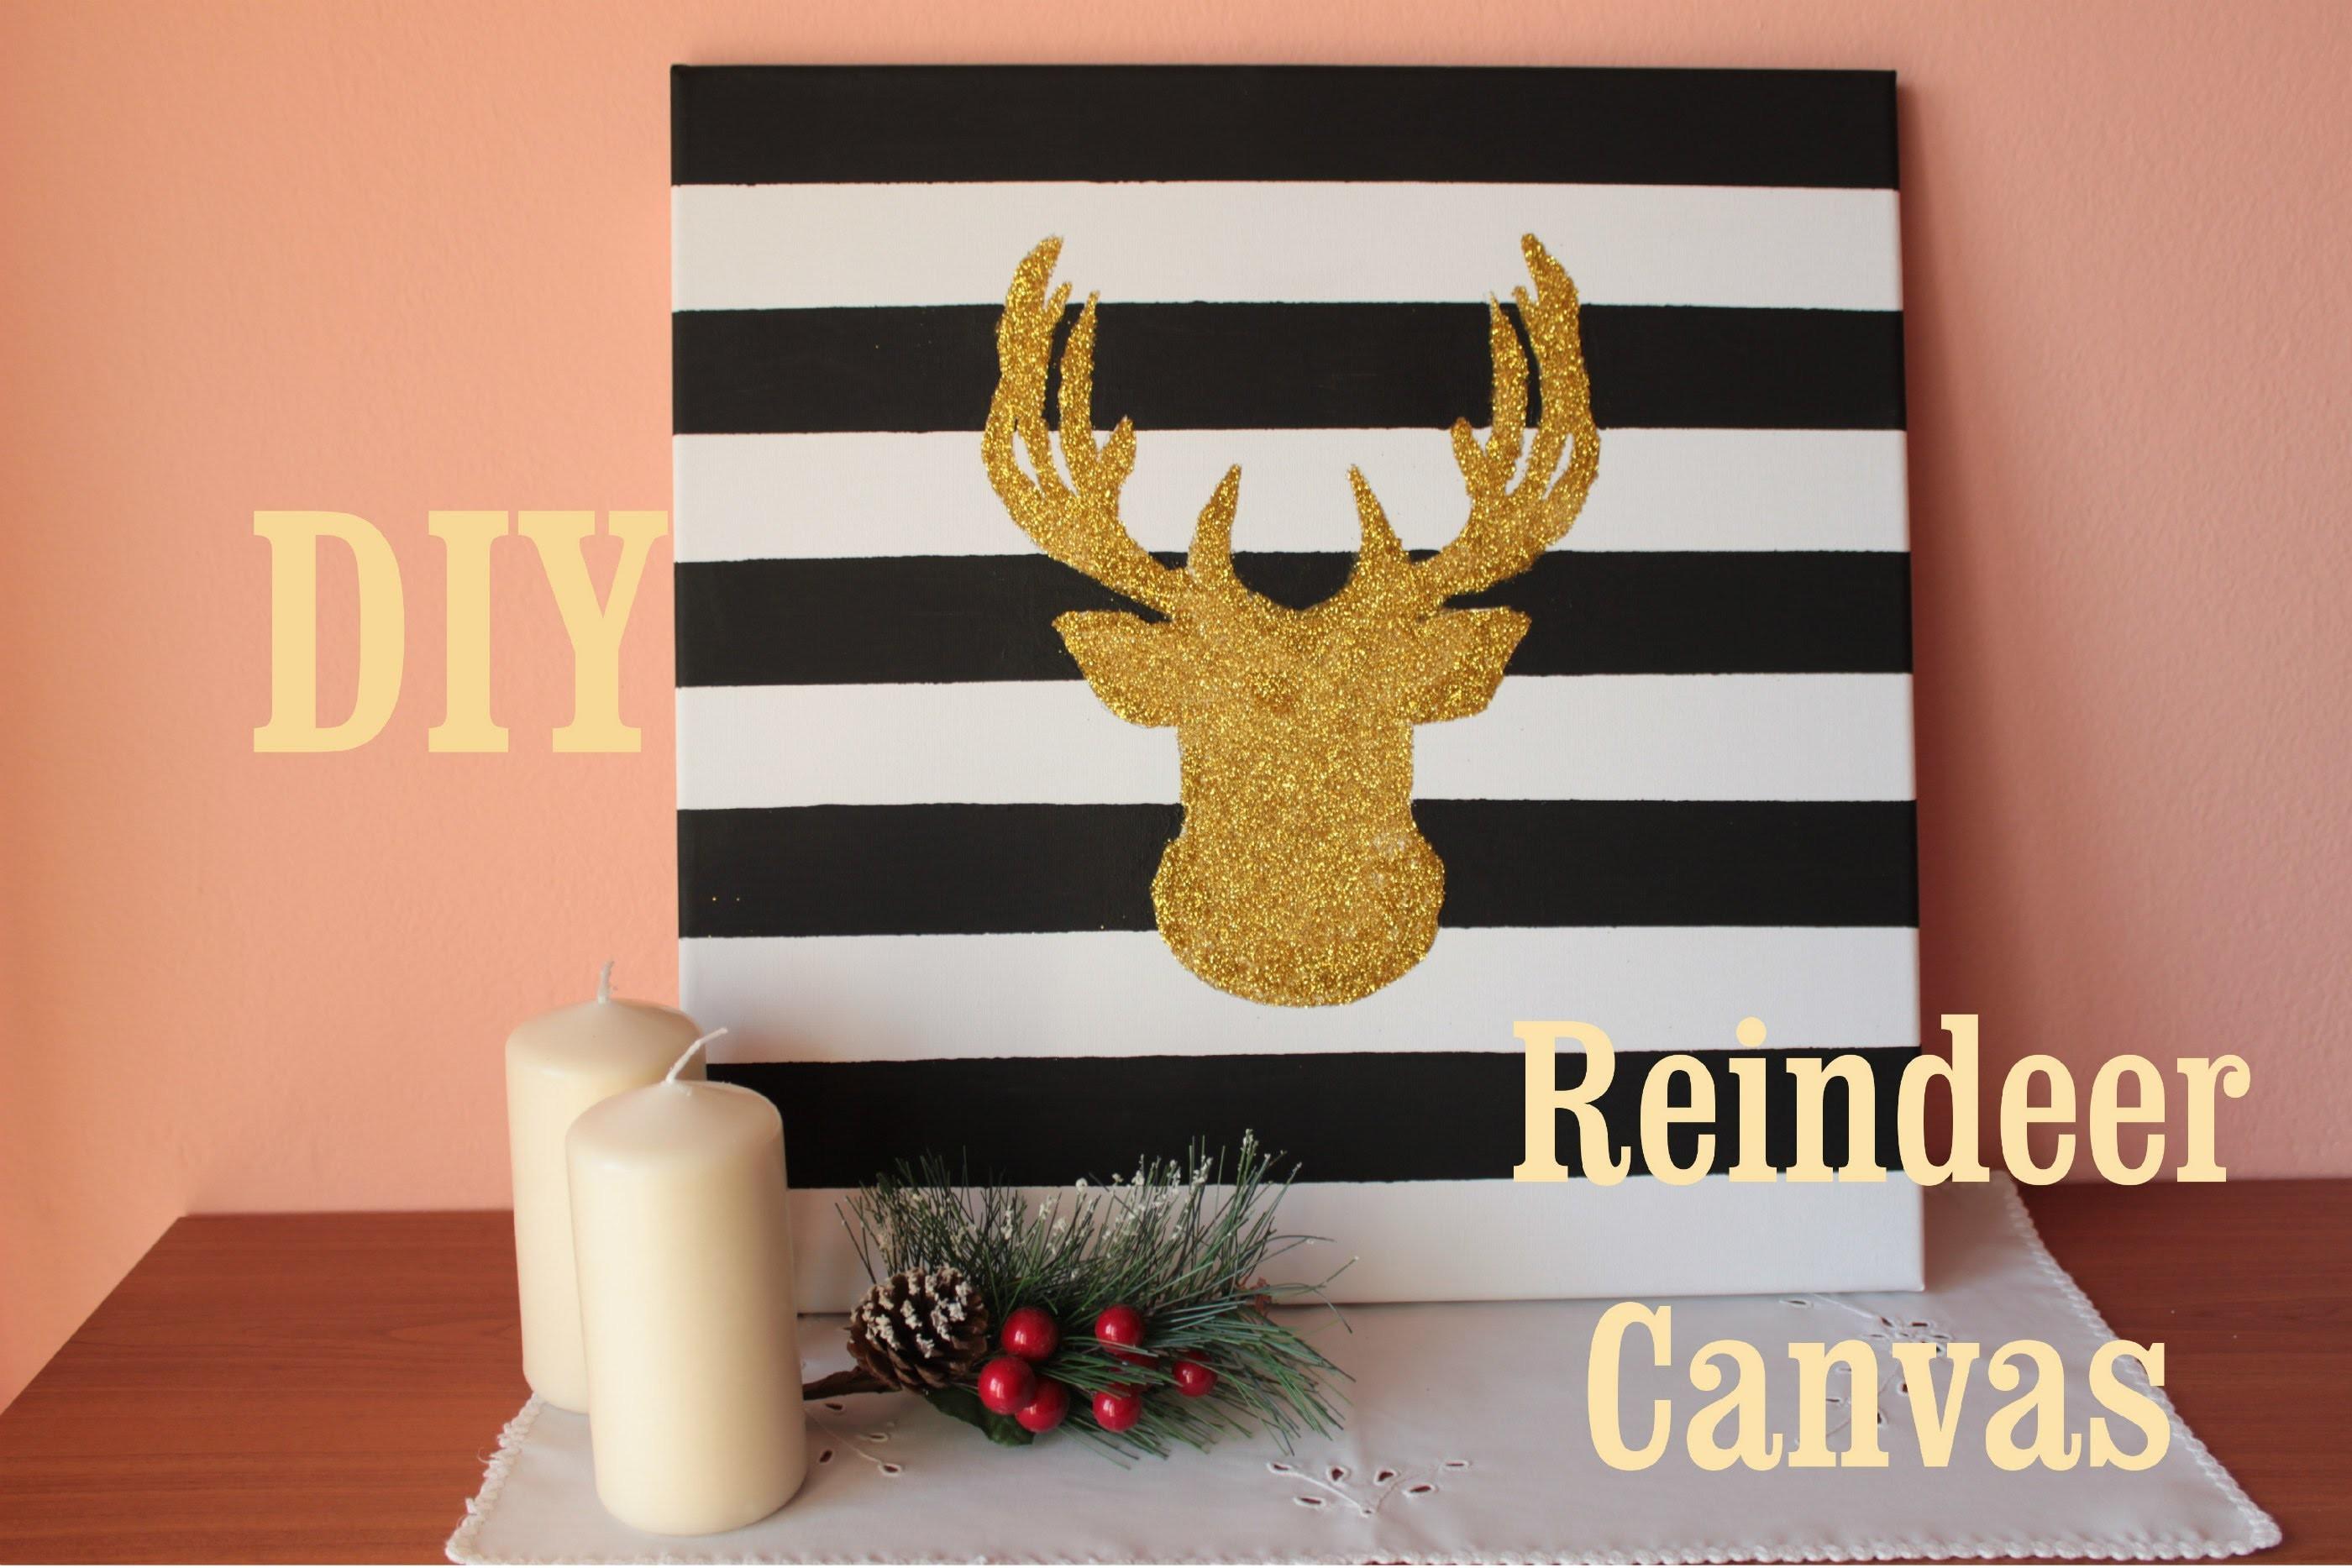 DIY Christmas Decore: Reindeer Canvas